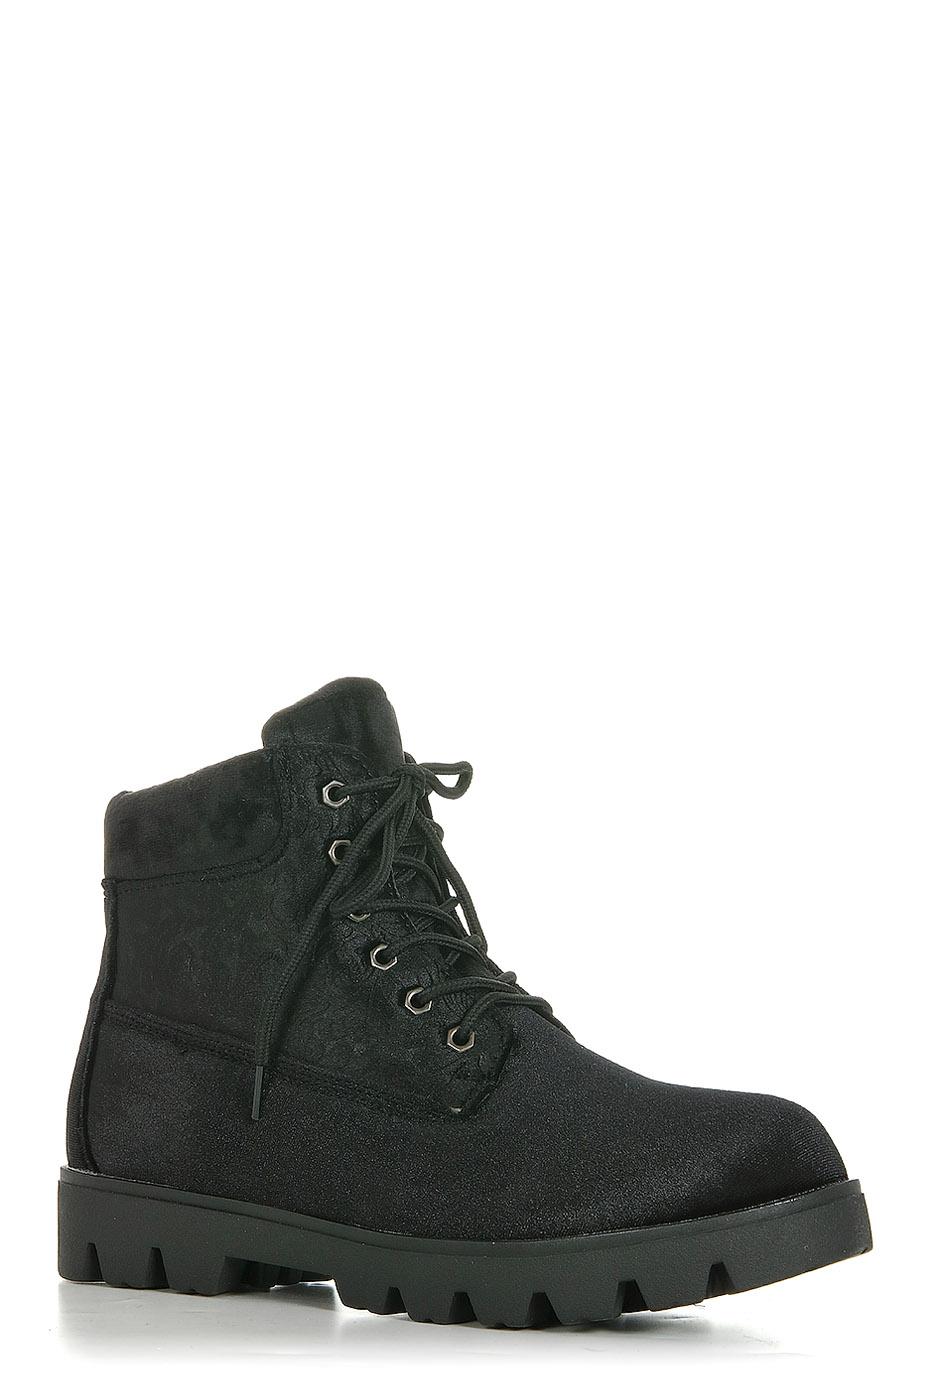 Ботинки TOPLAND2352-PB76174B/BLACK